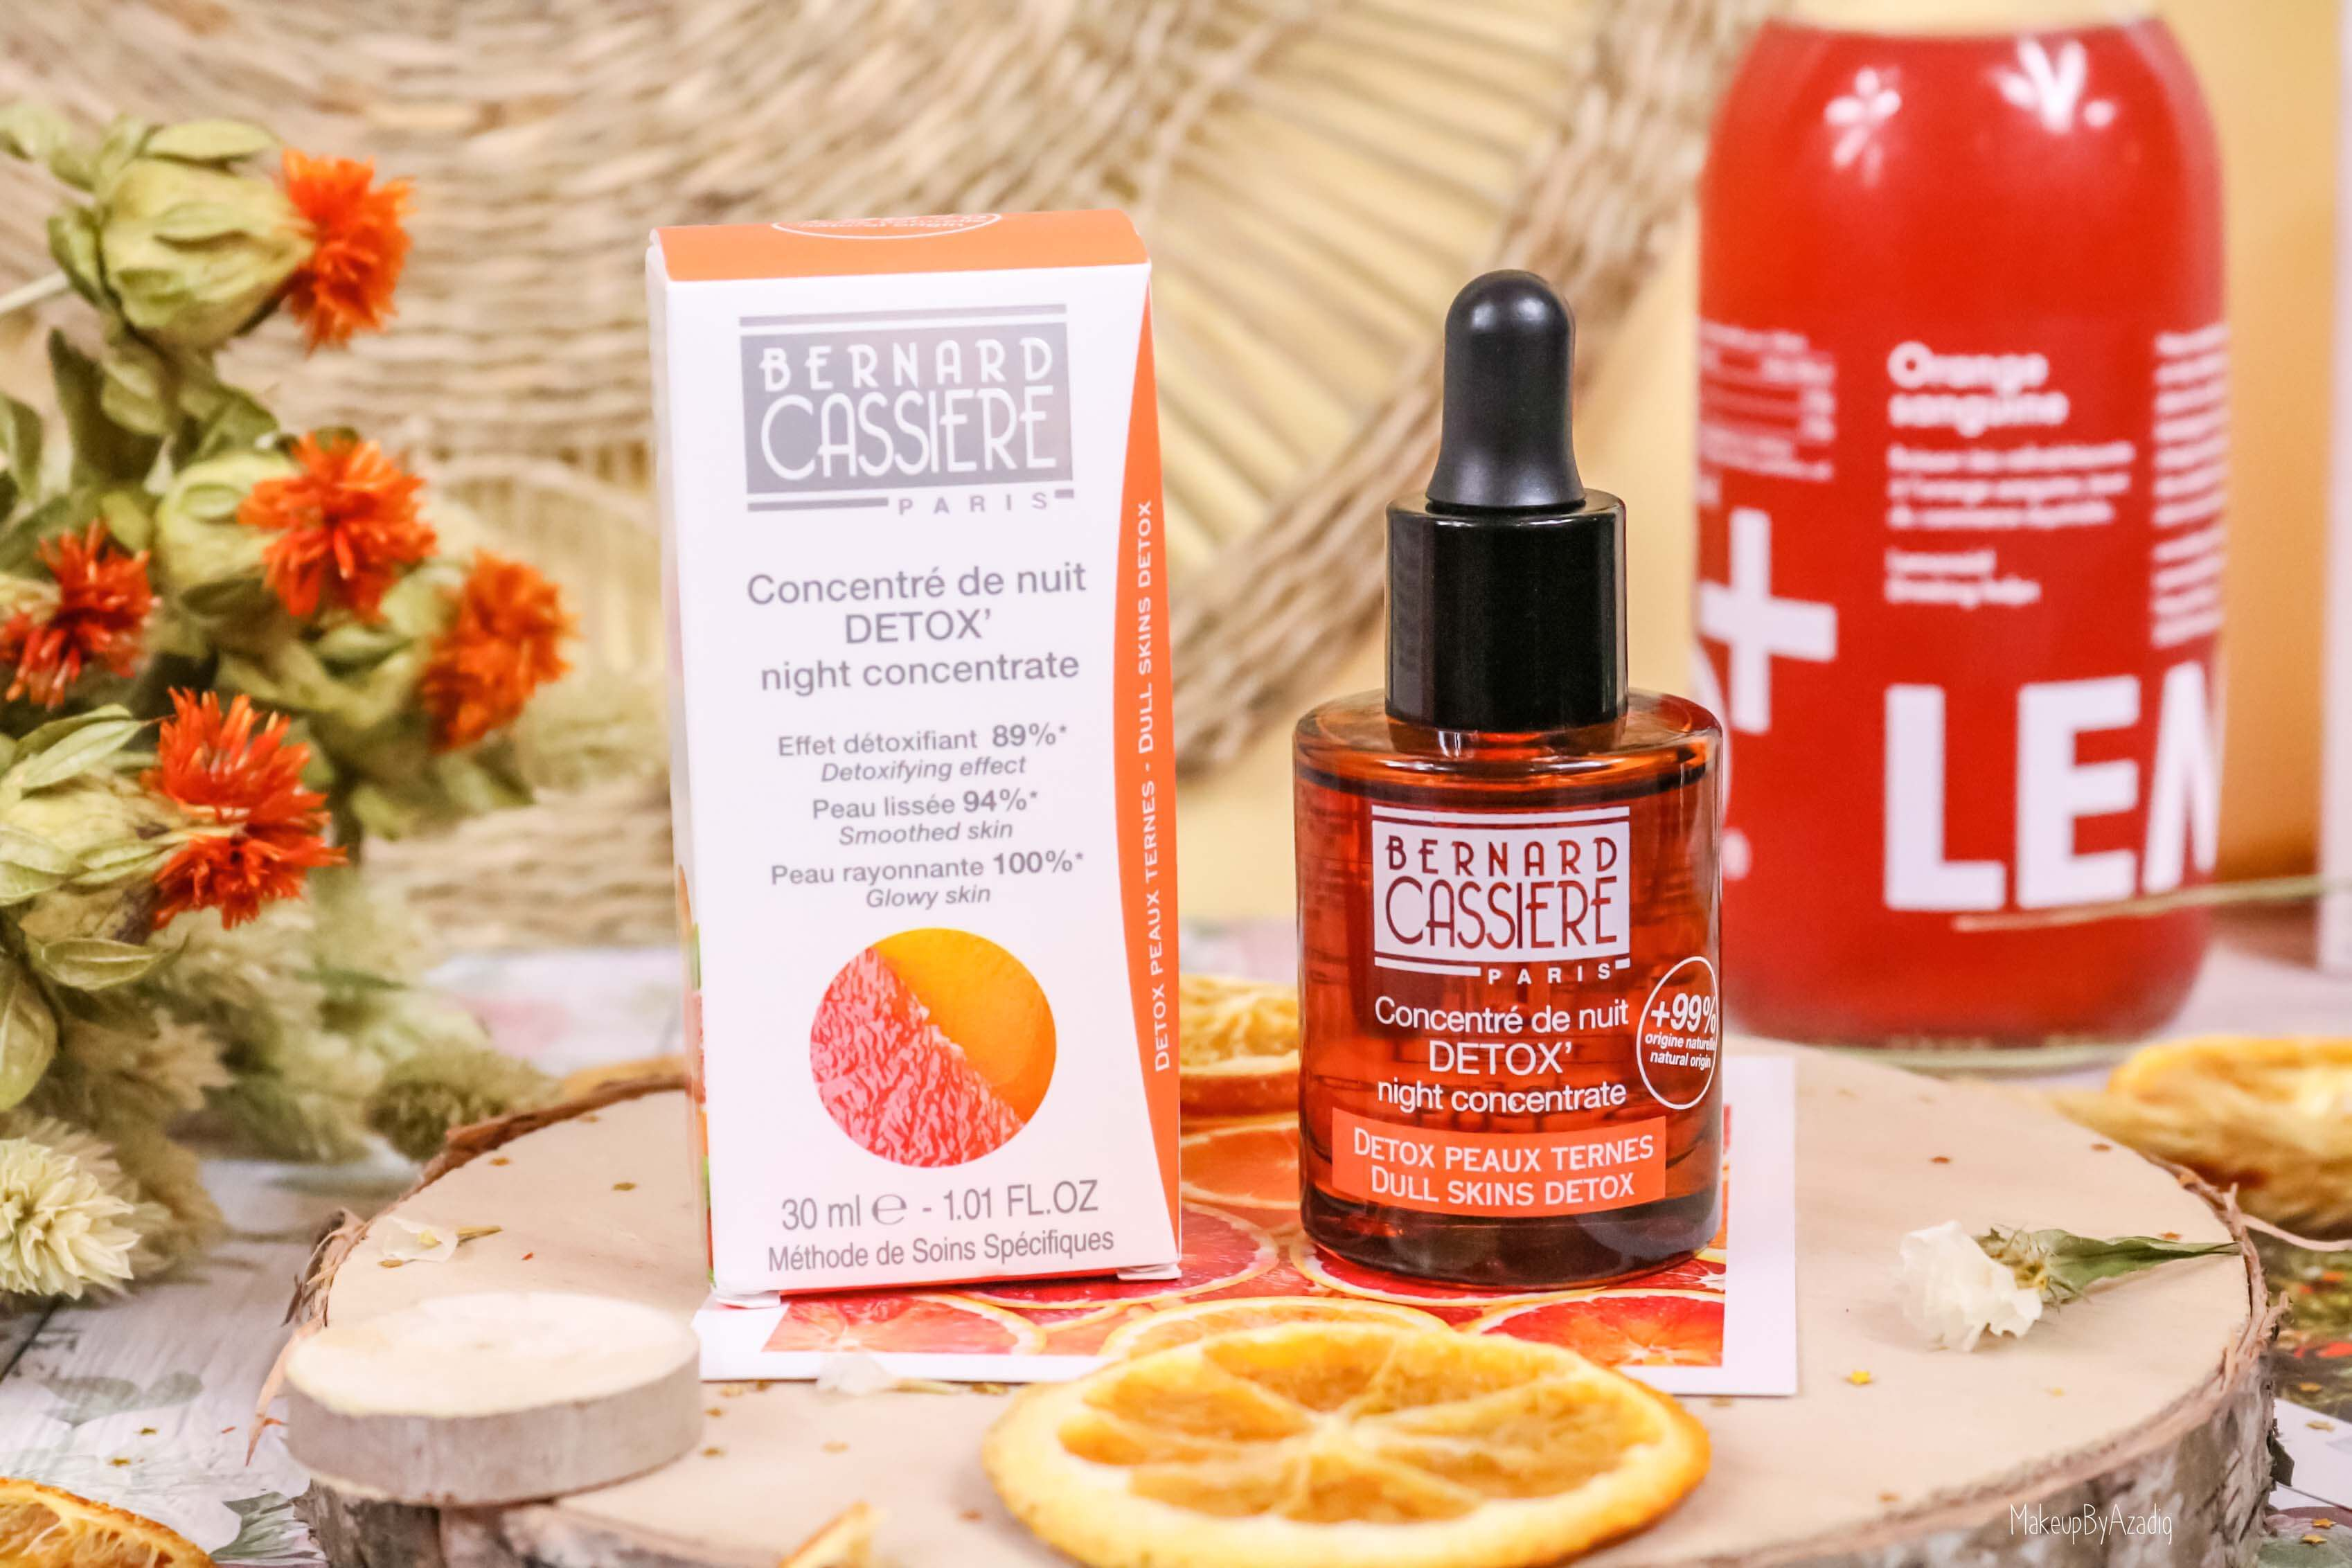 revue-produits-bernard-cassiere-bio-detox-orange-sanguine-masque-paris-institut-concentre-nuit-avis-prix-soin-makeupbyazadig-peaux-ternes